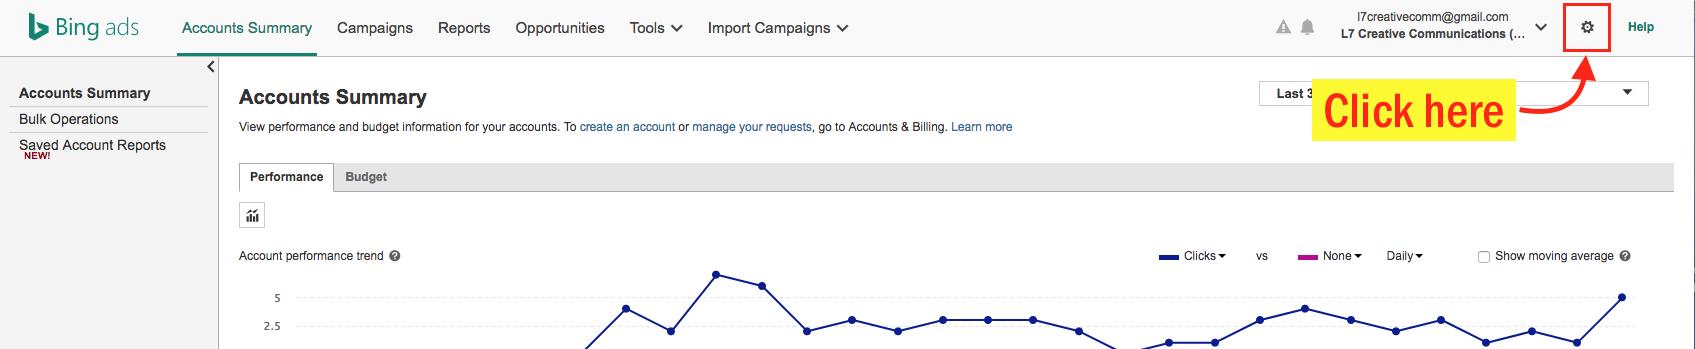 Edit Your Bing Ads Payment Info - Step 2 Screenshot